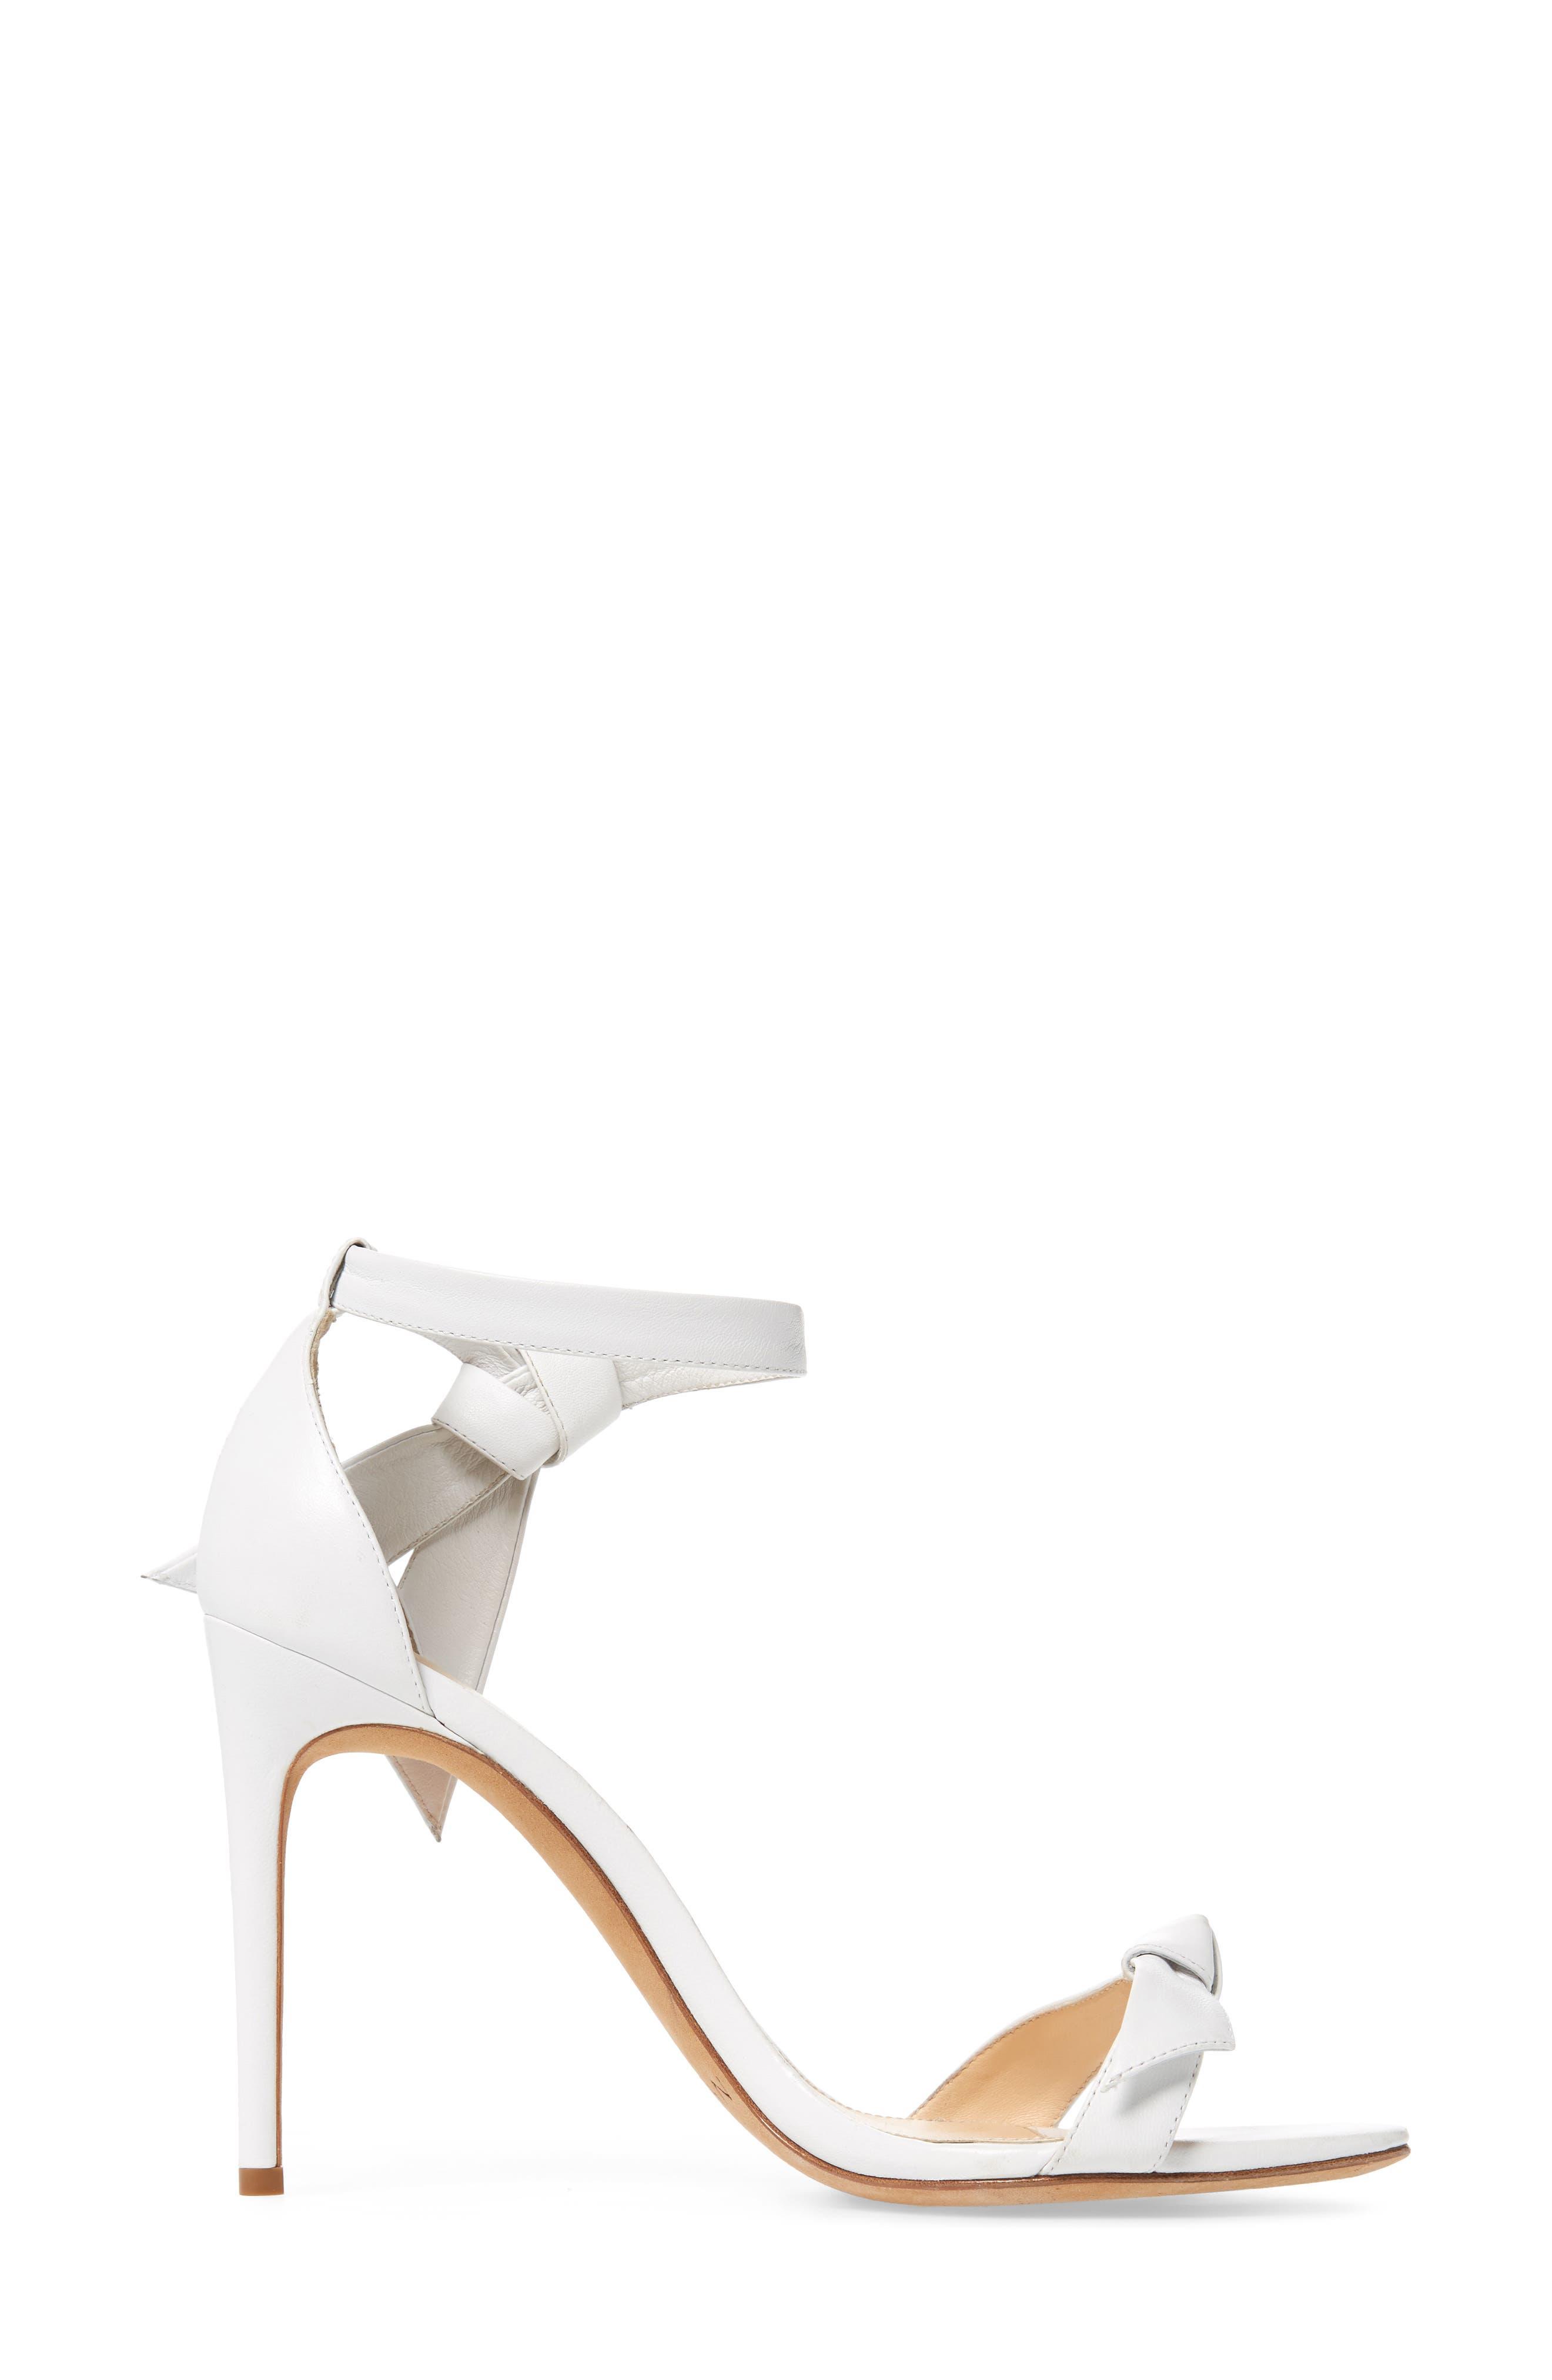 Alternate Image 3  - Alexandre Birman 'Clarita' Ankle Tie Sandal (Women)